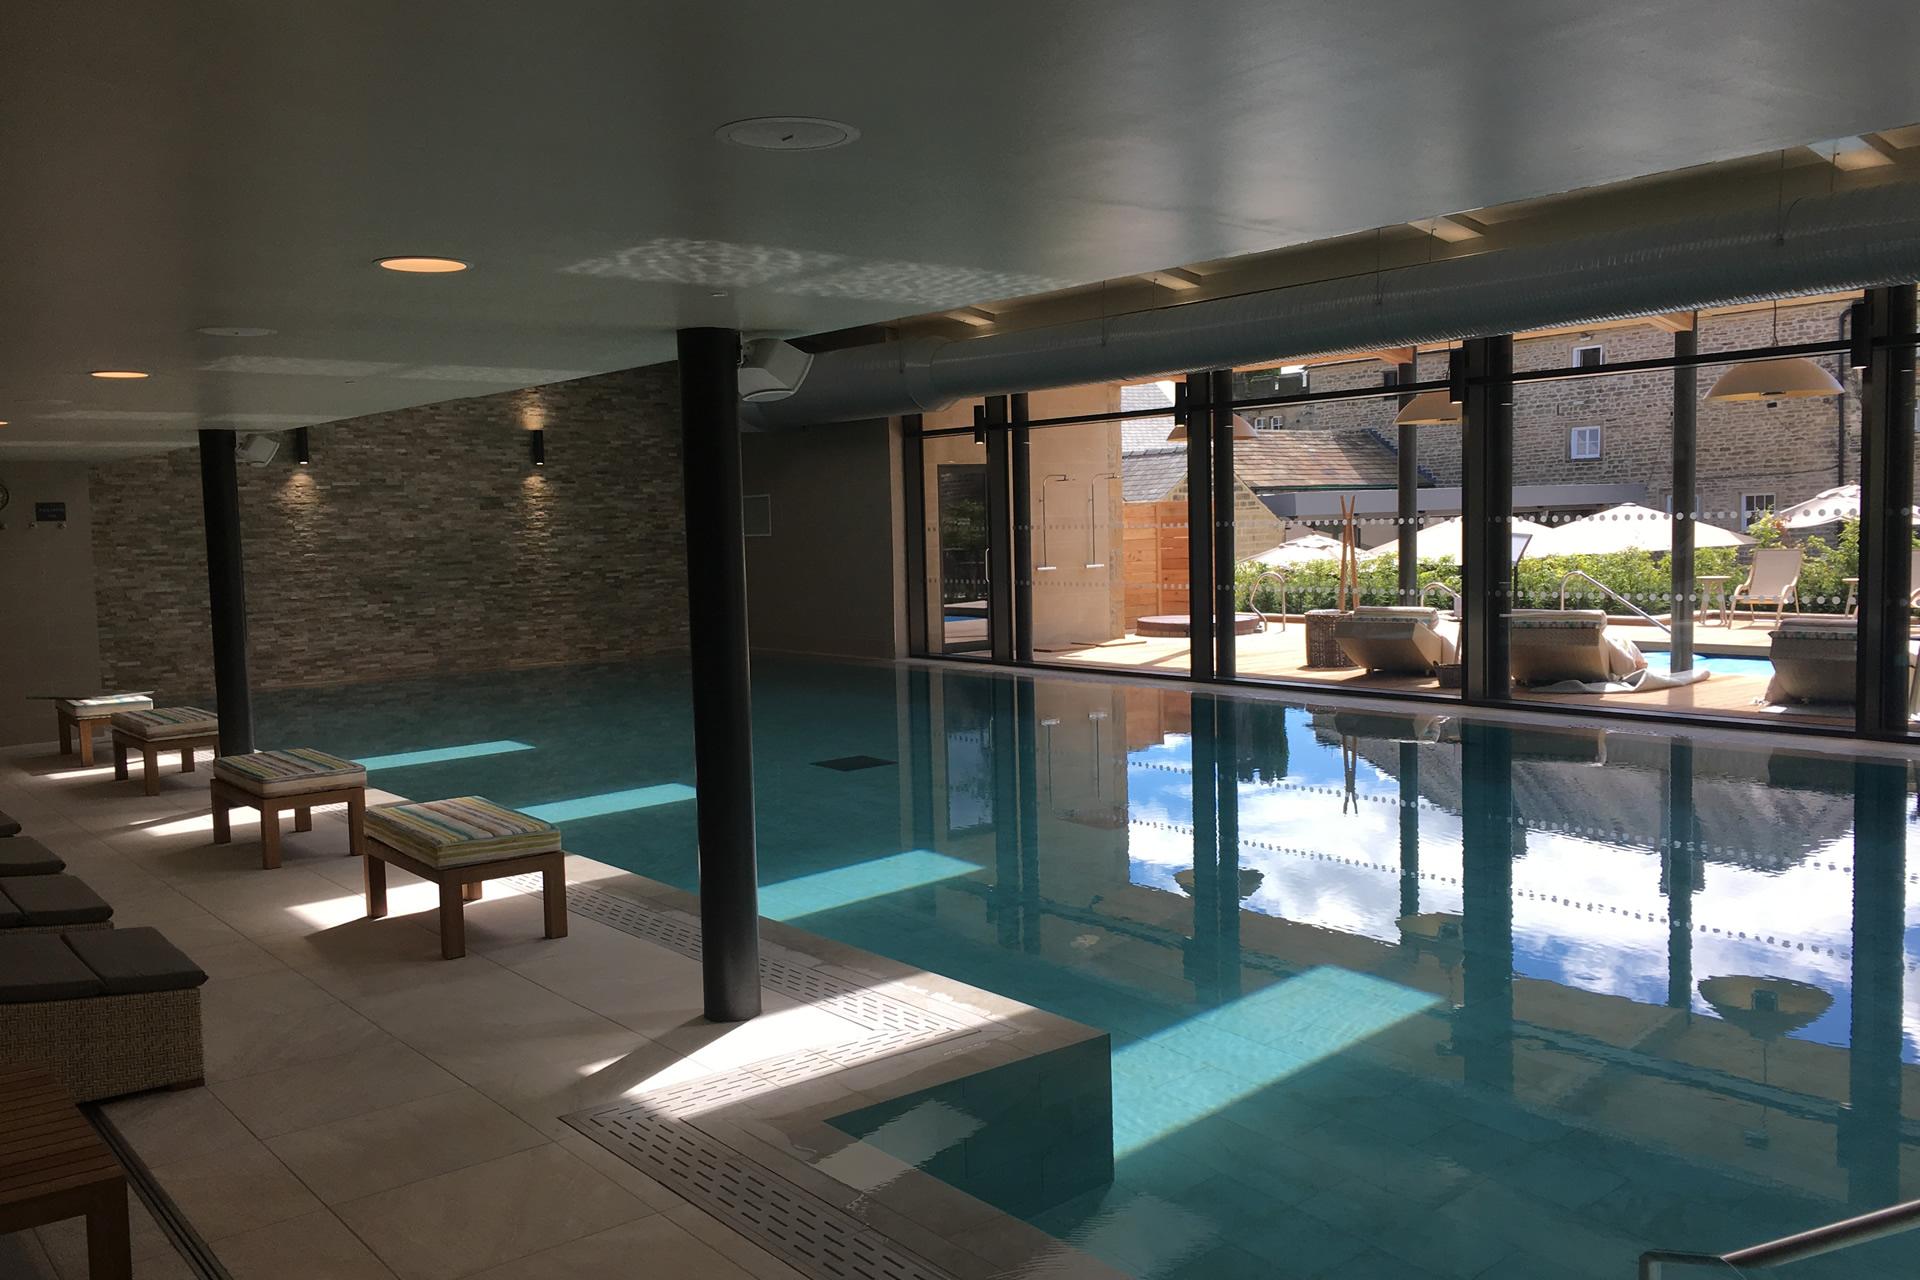 swinton park swimming pool